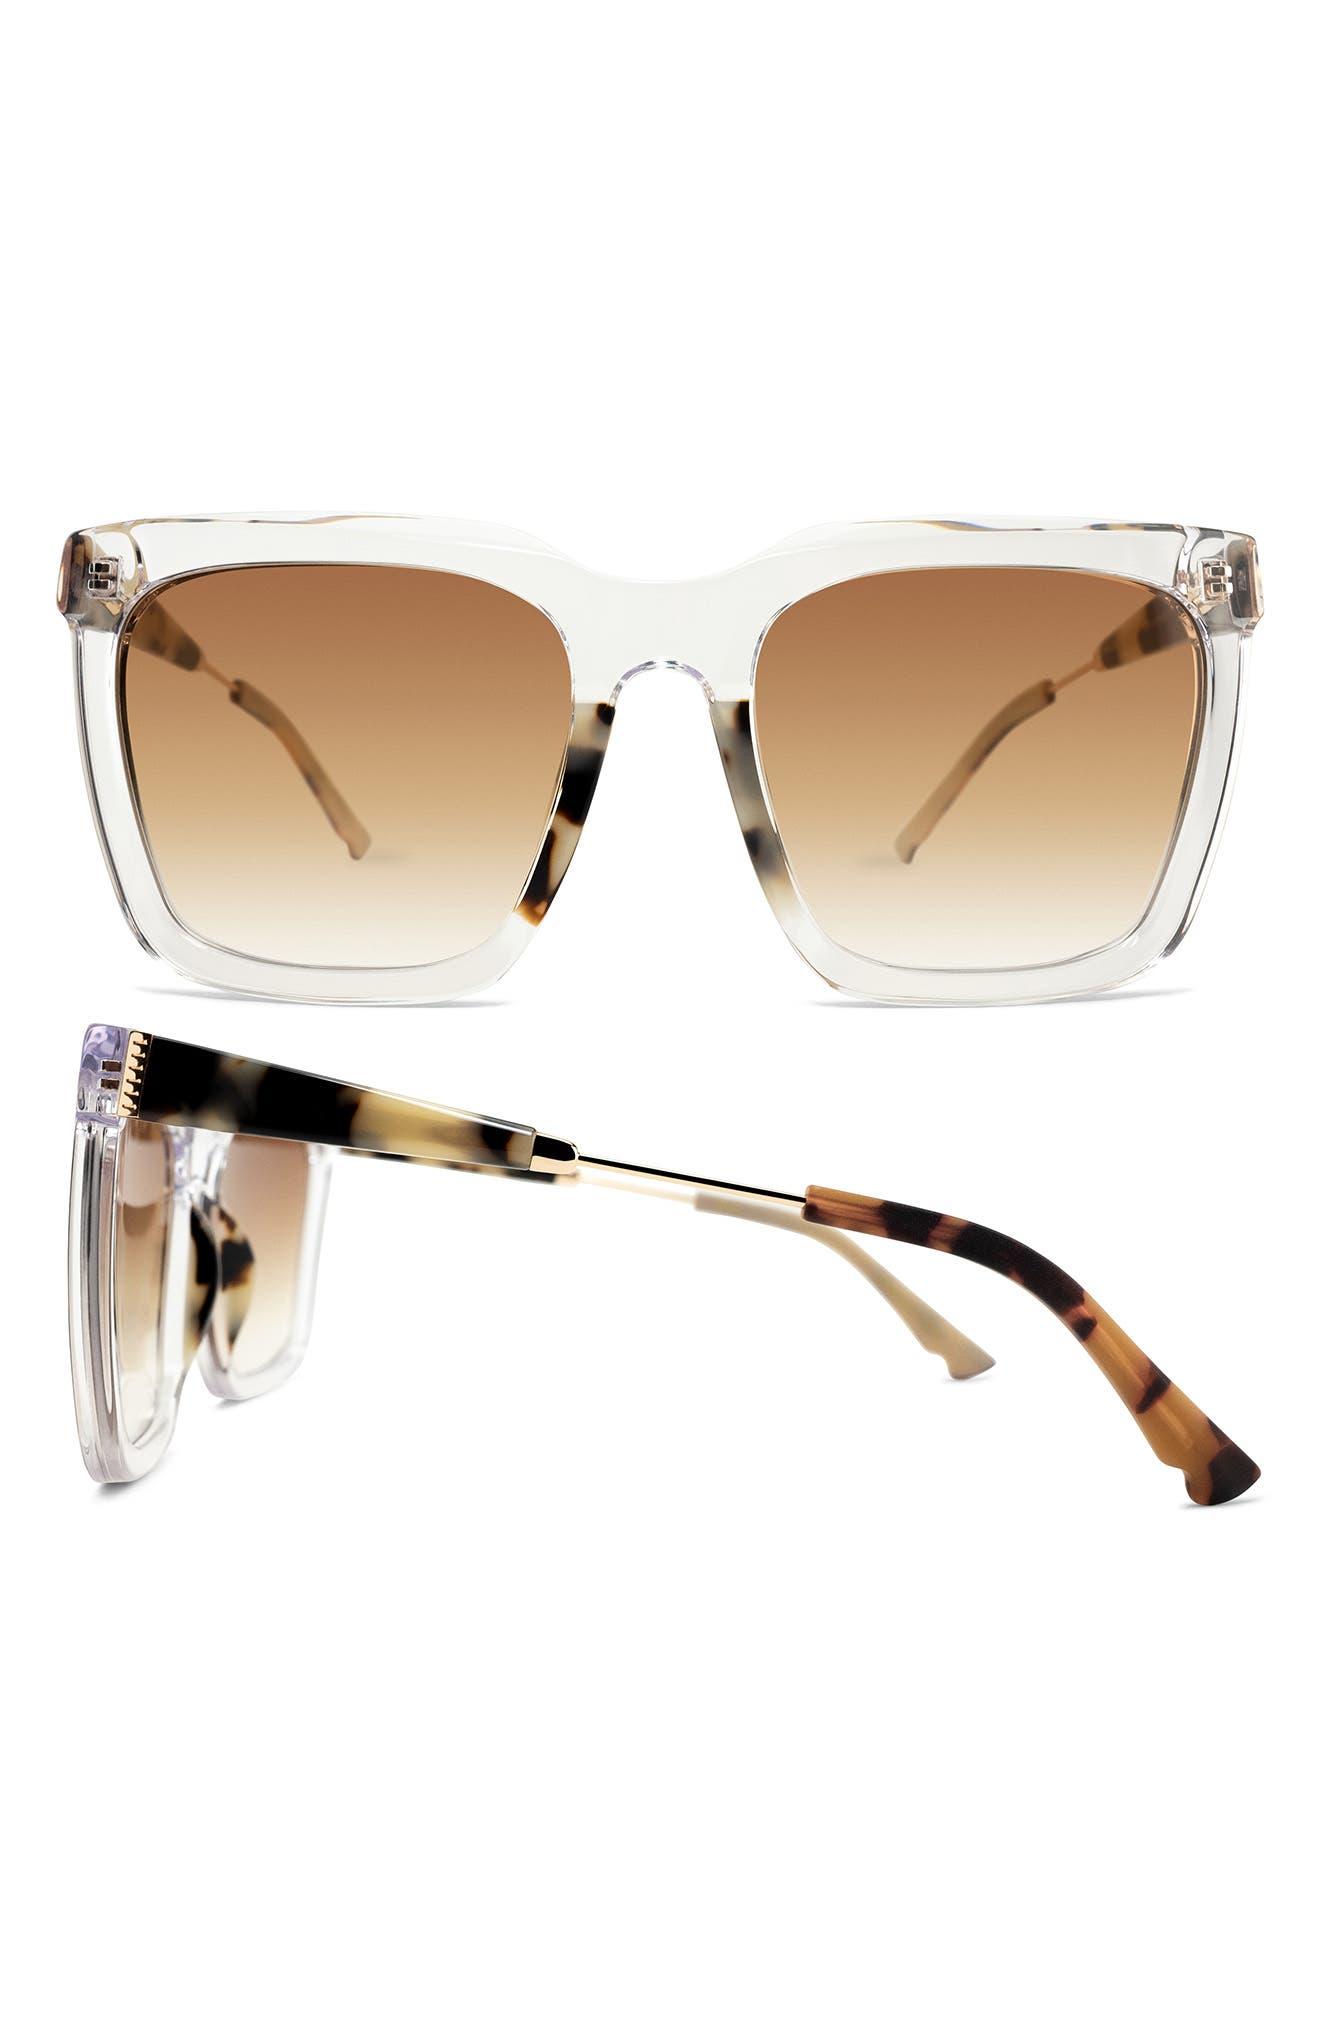 Lively 55mm Gradient Square Sunglasses